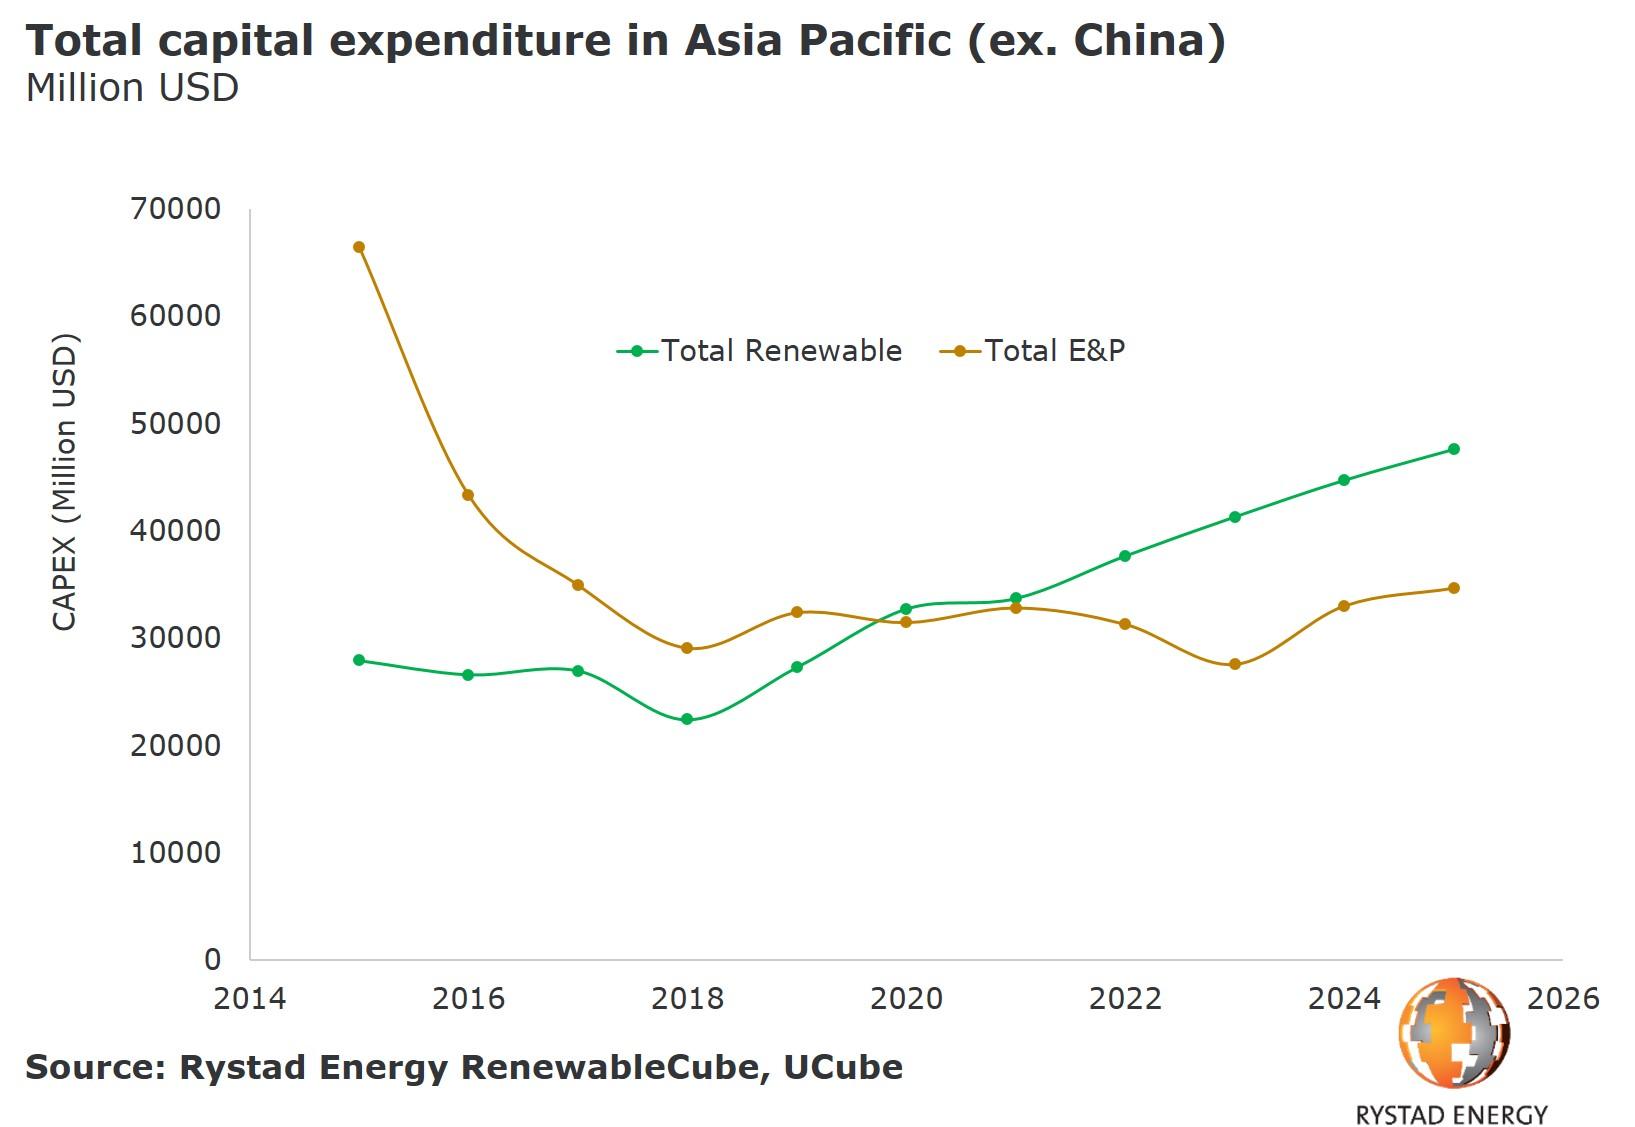 20190523_PR_Charts_Renewed energy in Asian Upstream total capex 2.jpg